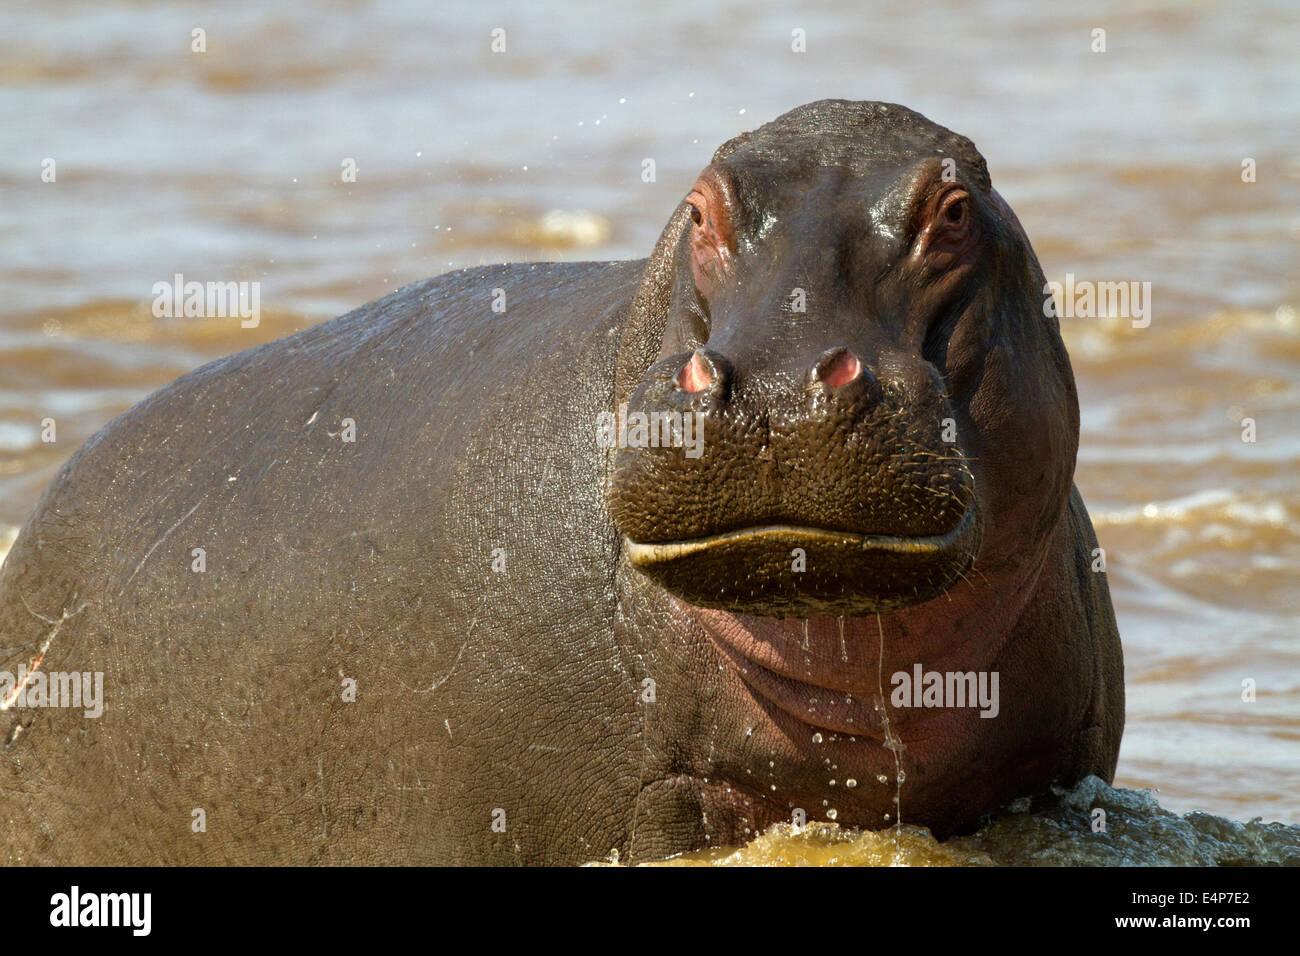 Flusspferd angriffslustig - Stock Image